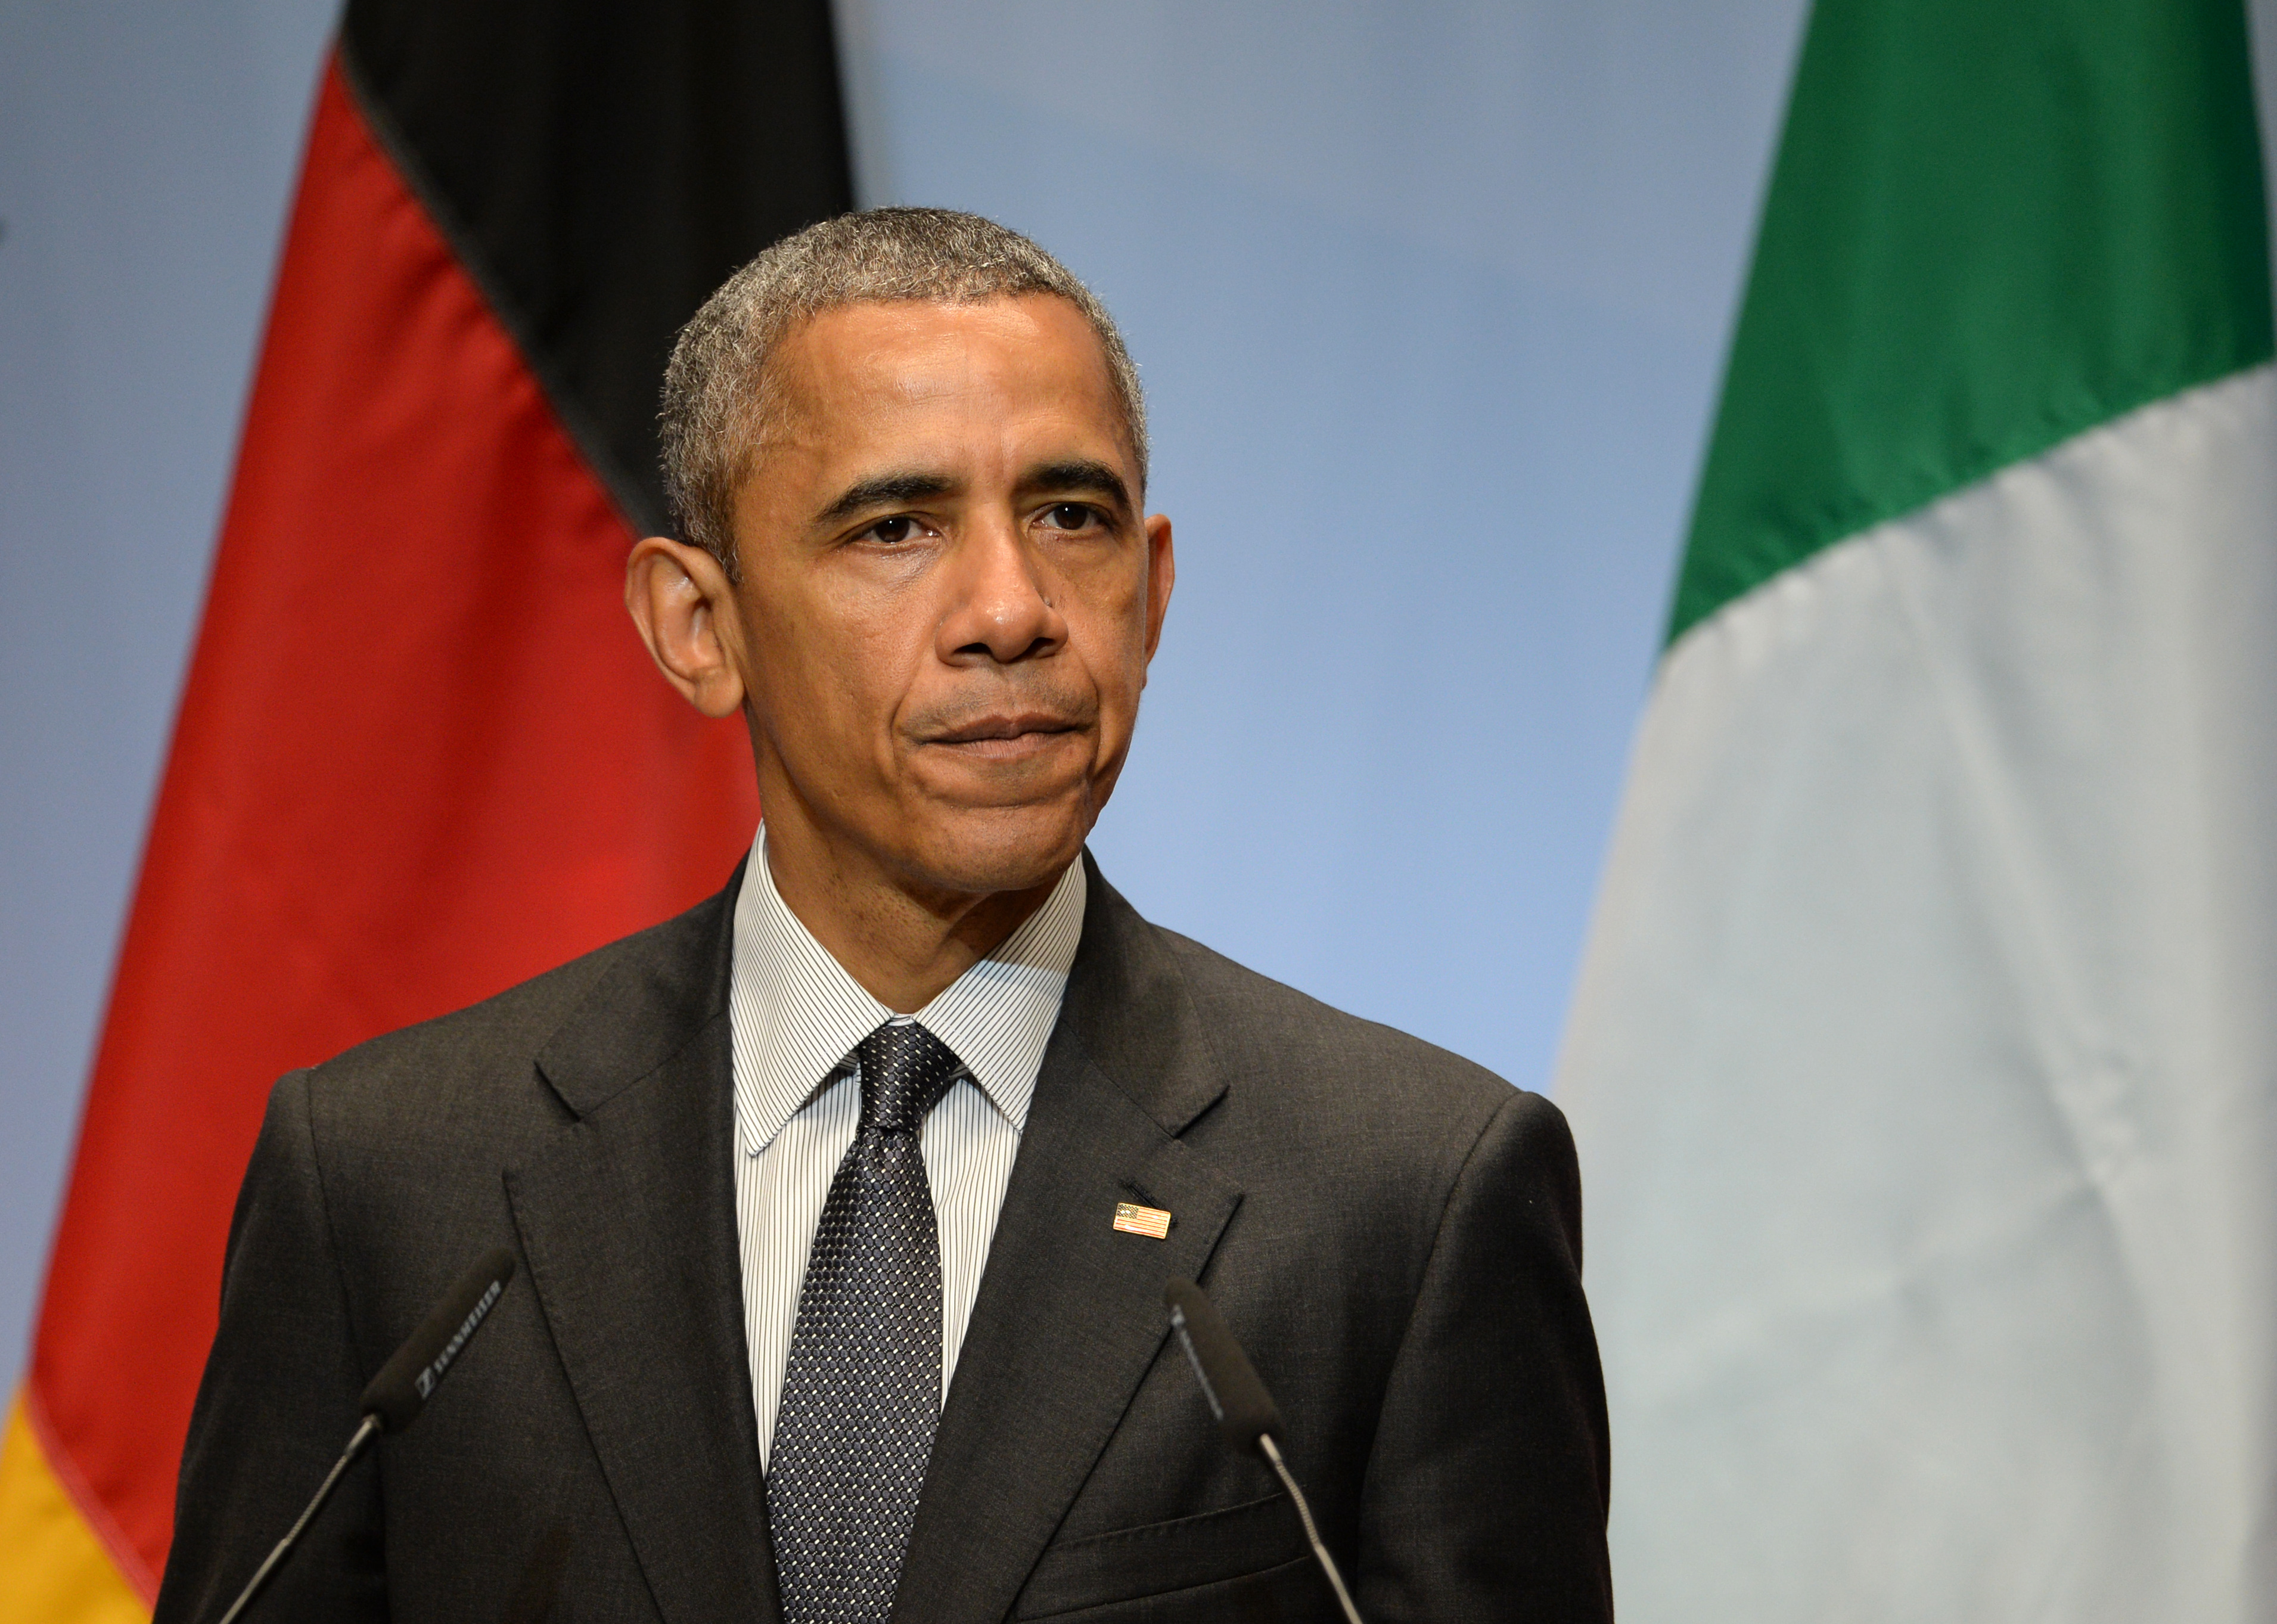 US President Barack Obama speaks at a press conference during the G7 Summit in Schloss Elmau in Elmau,Germany, 08 June 2015.